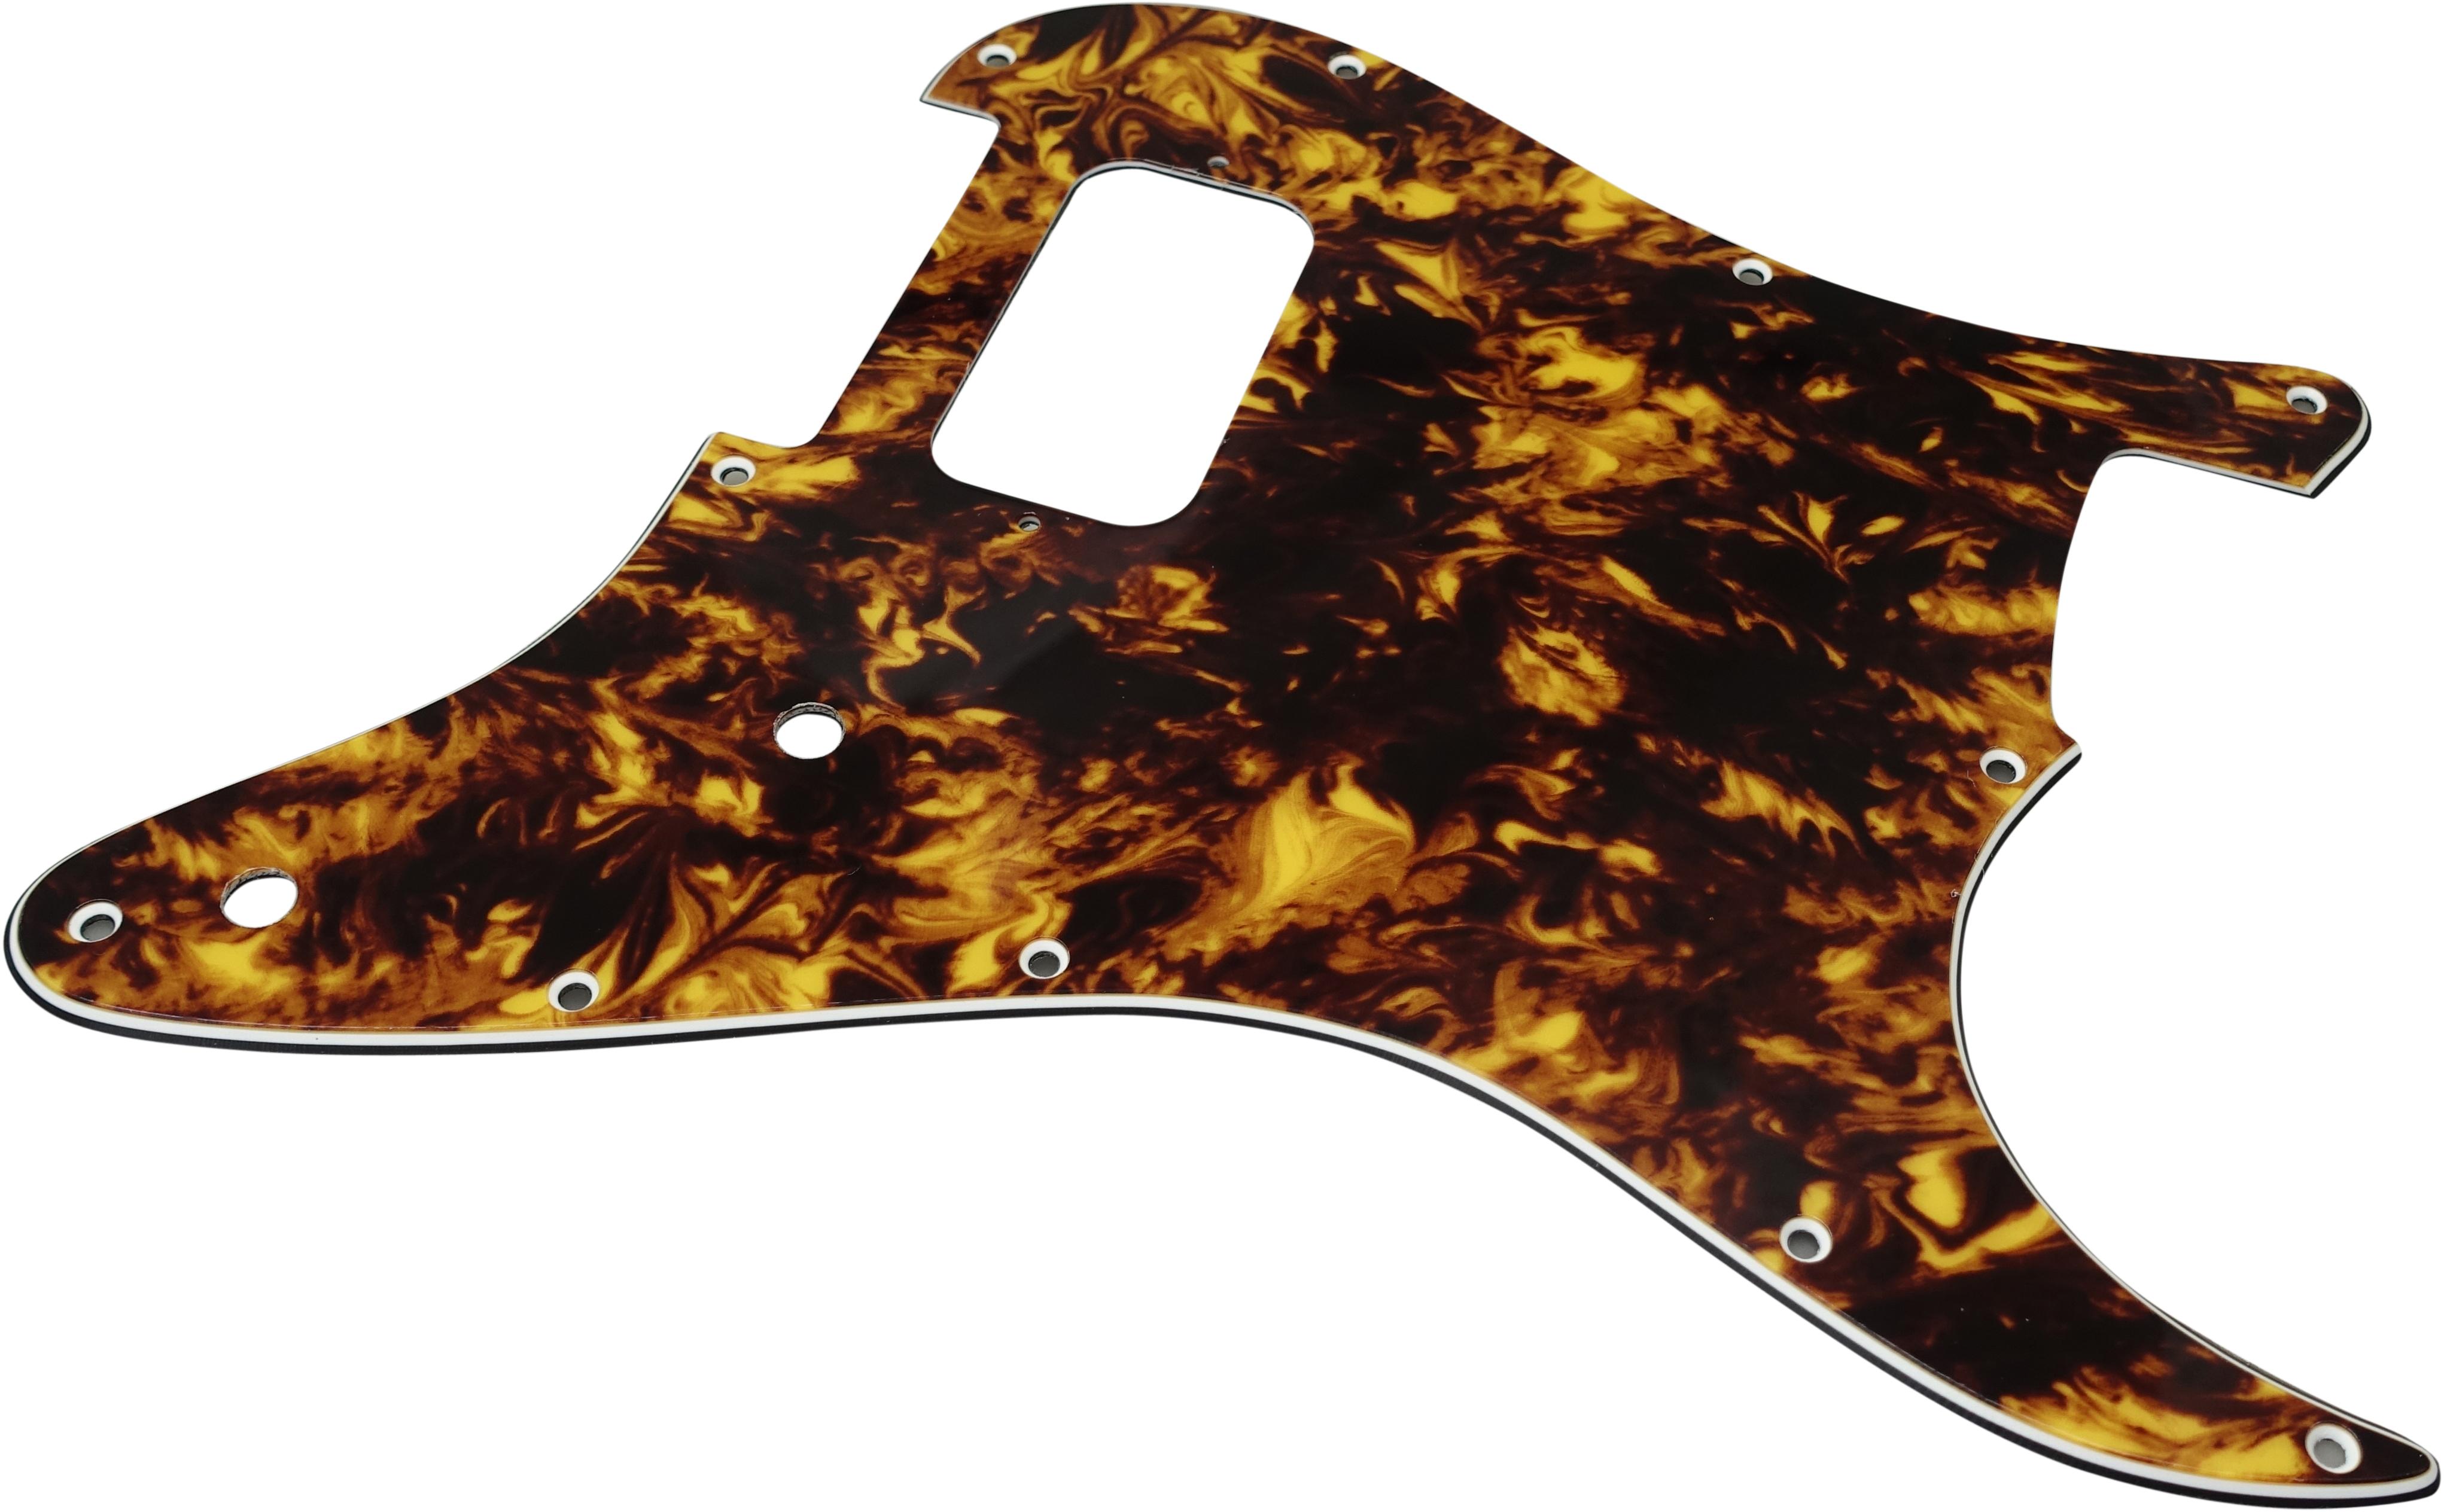 Toronzo Pickguard ST-H-2P-3PLY-Marble Yellow